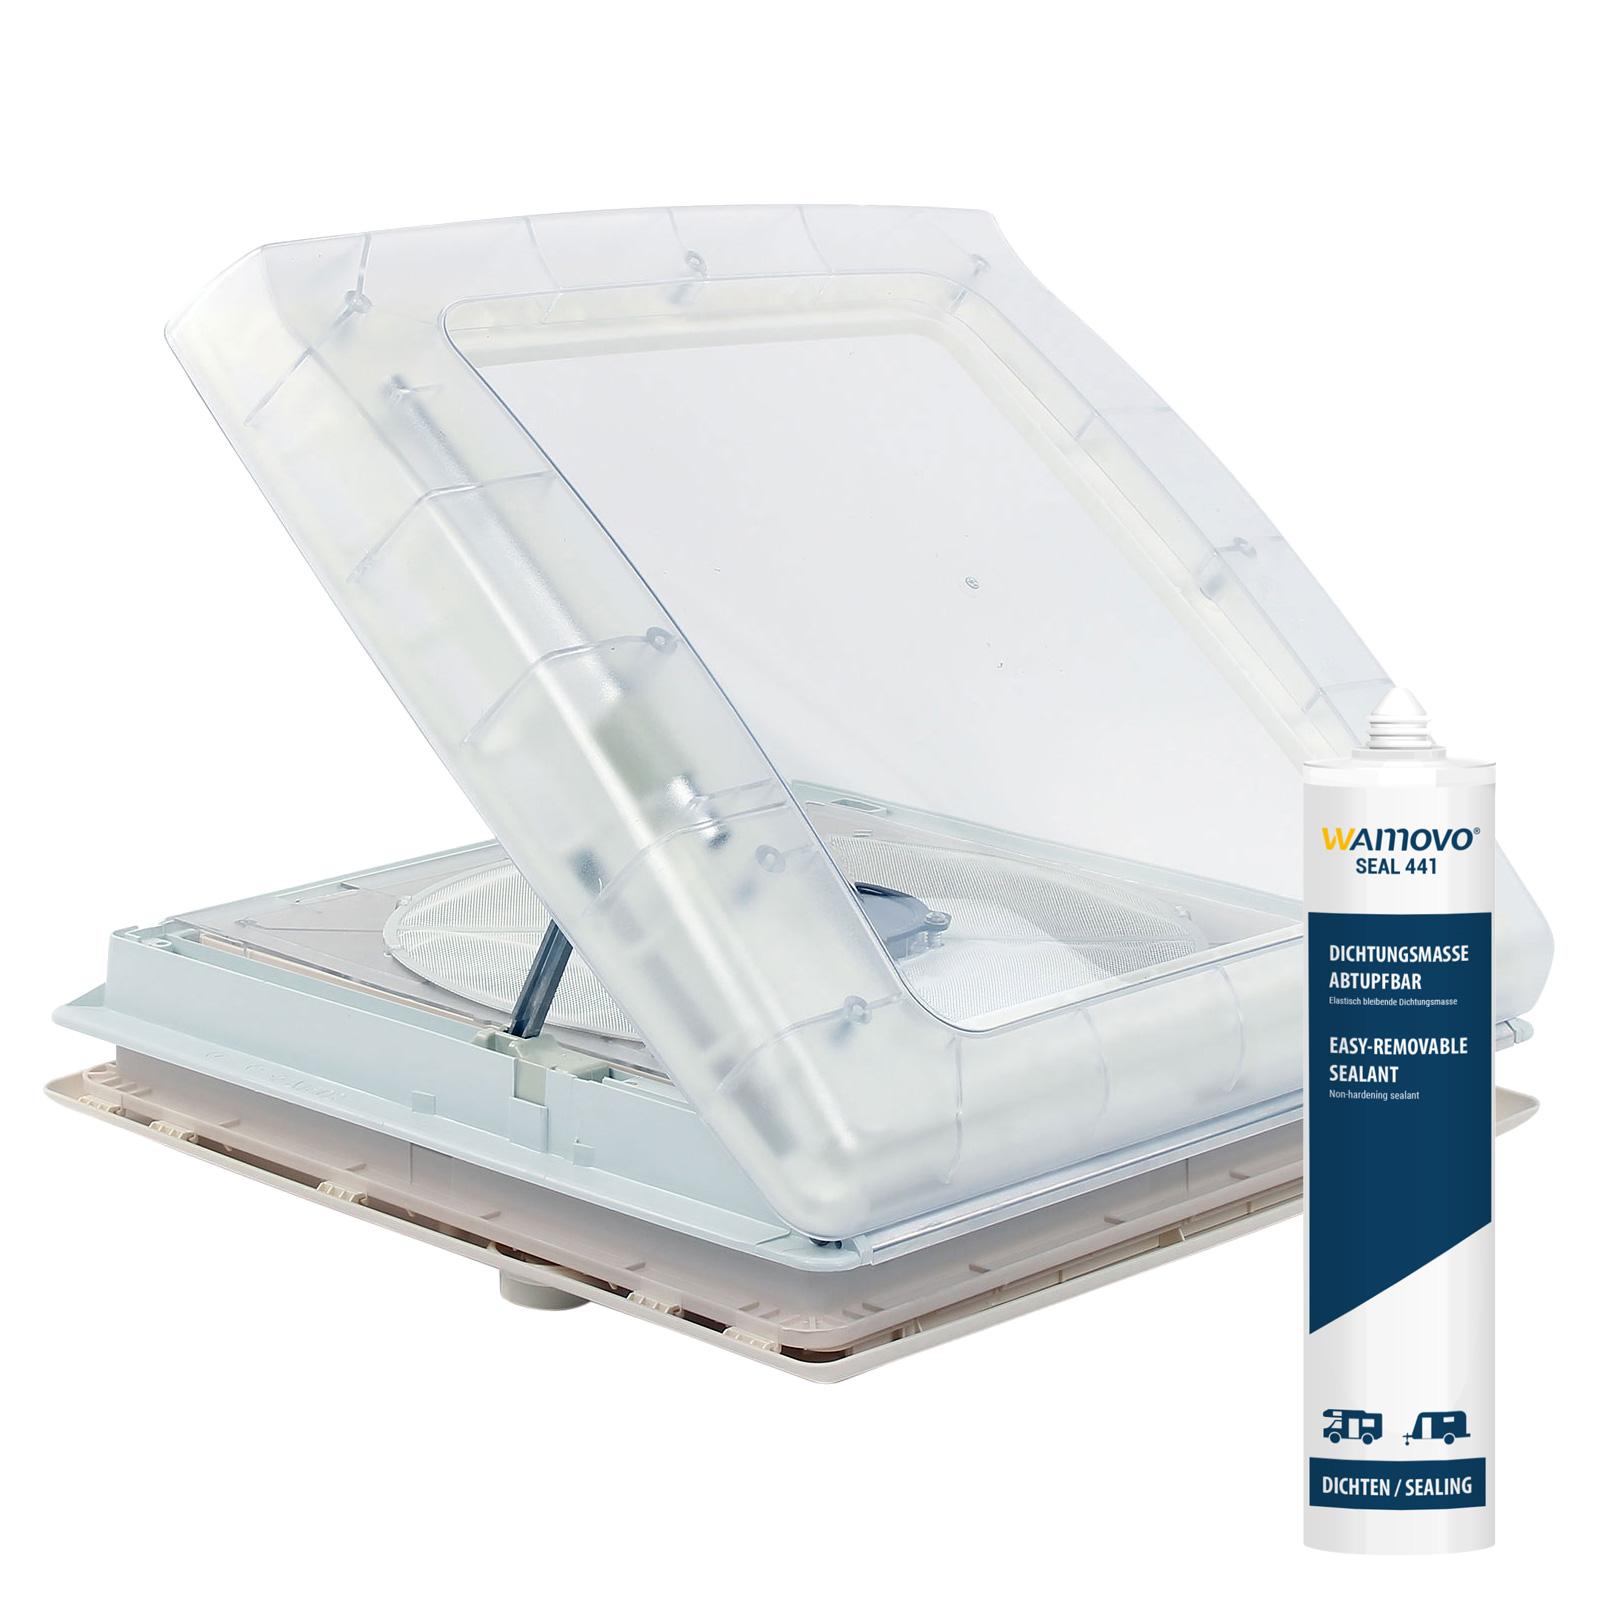 Thule® Kurbeldachhaube Omni-Vent transparent 40x40 12 Volt Ventilator + Dekalin